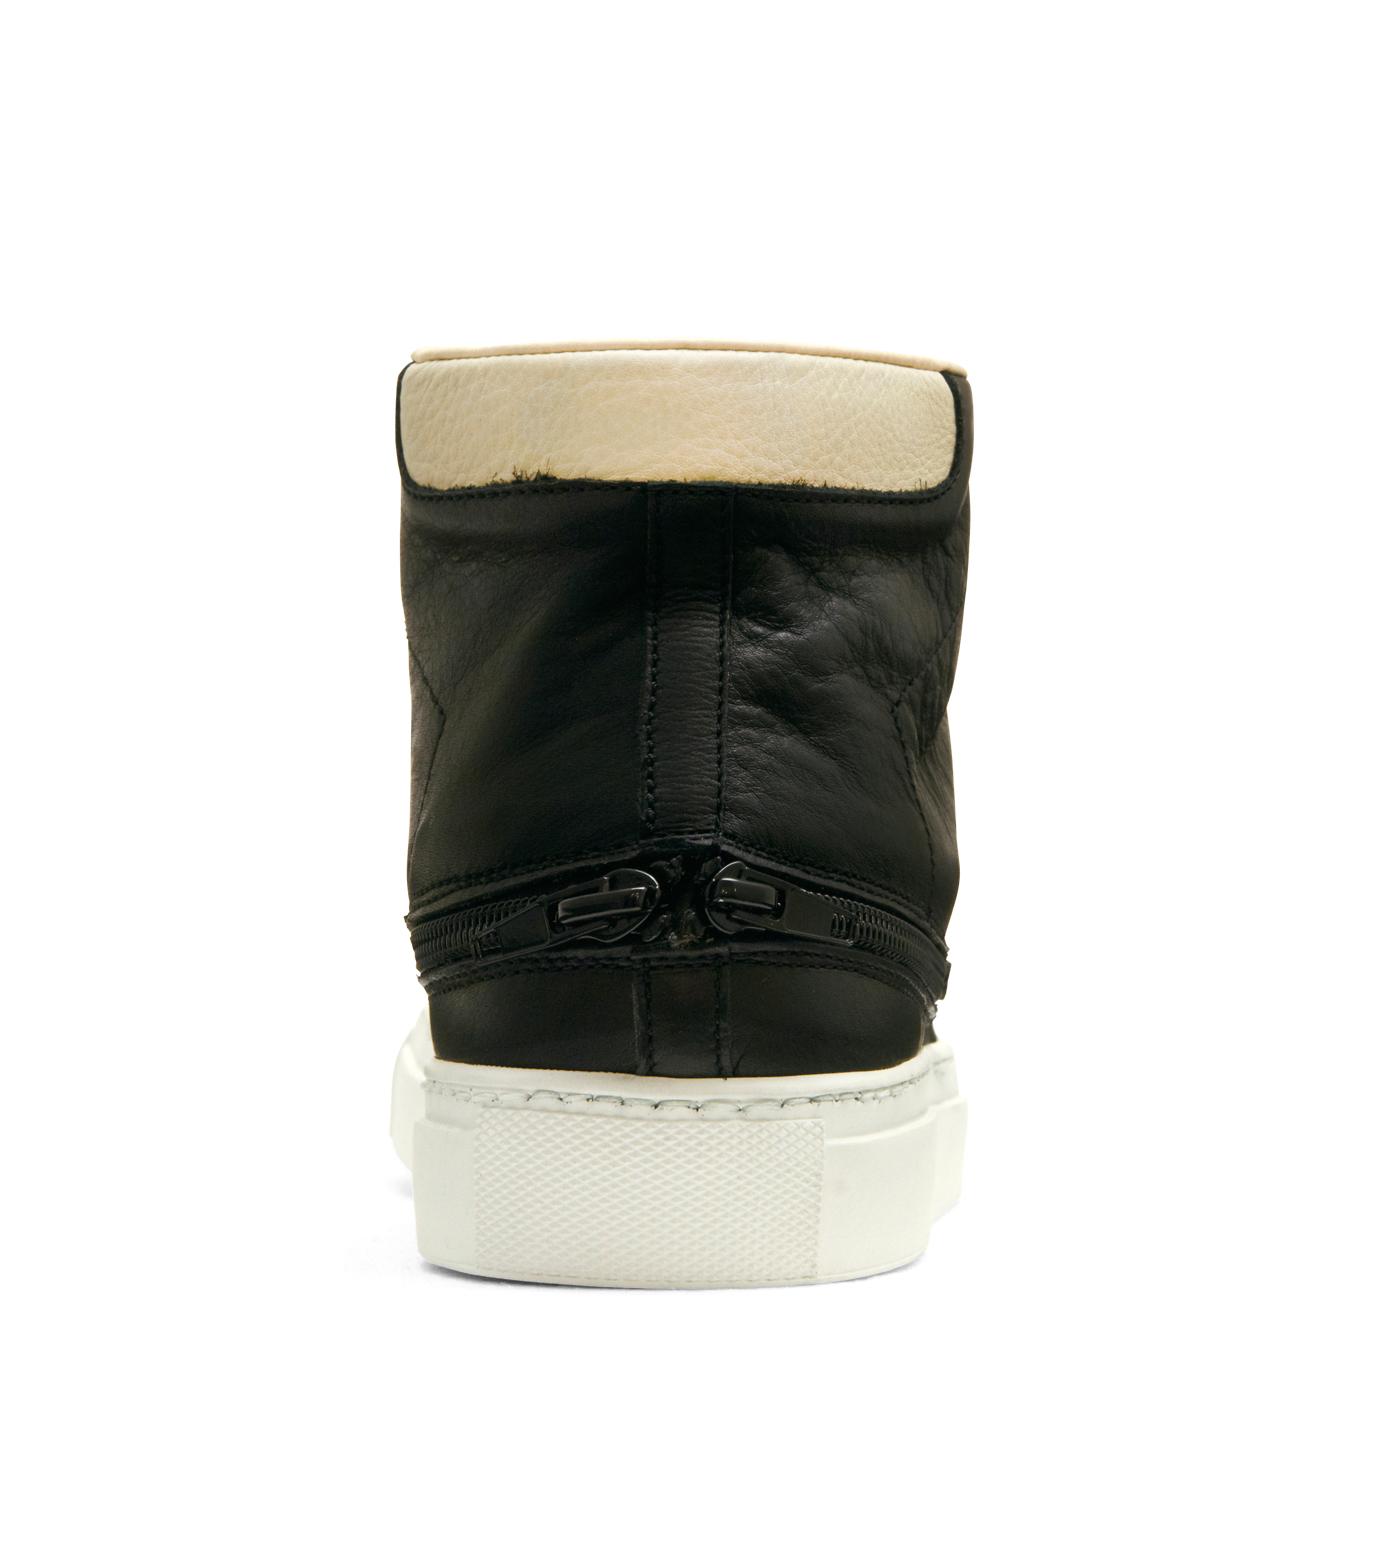 Trussardi(トラサルディ)のSeparate Sneaker-BLACK-1RS721-13 拡大詳細画像3